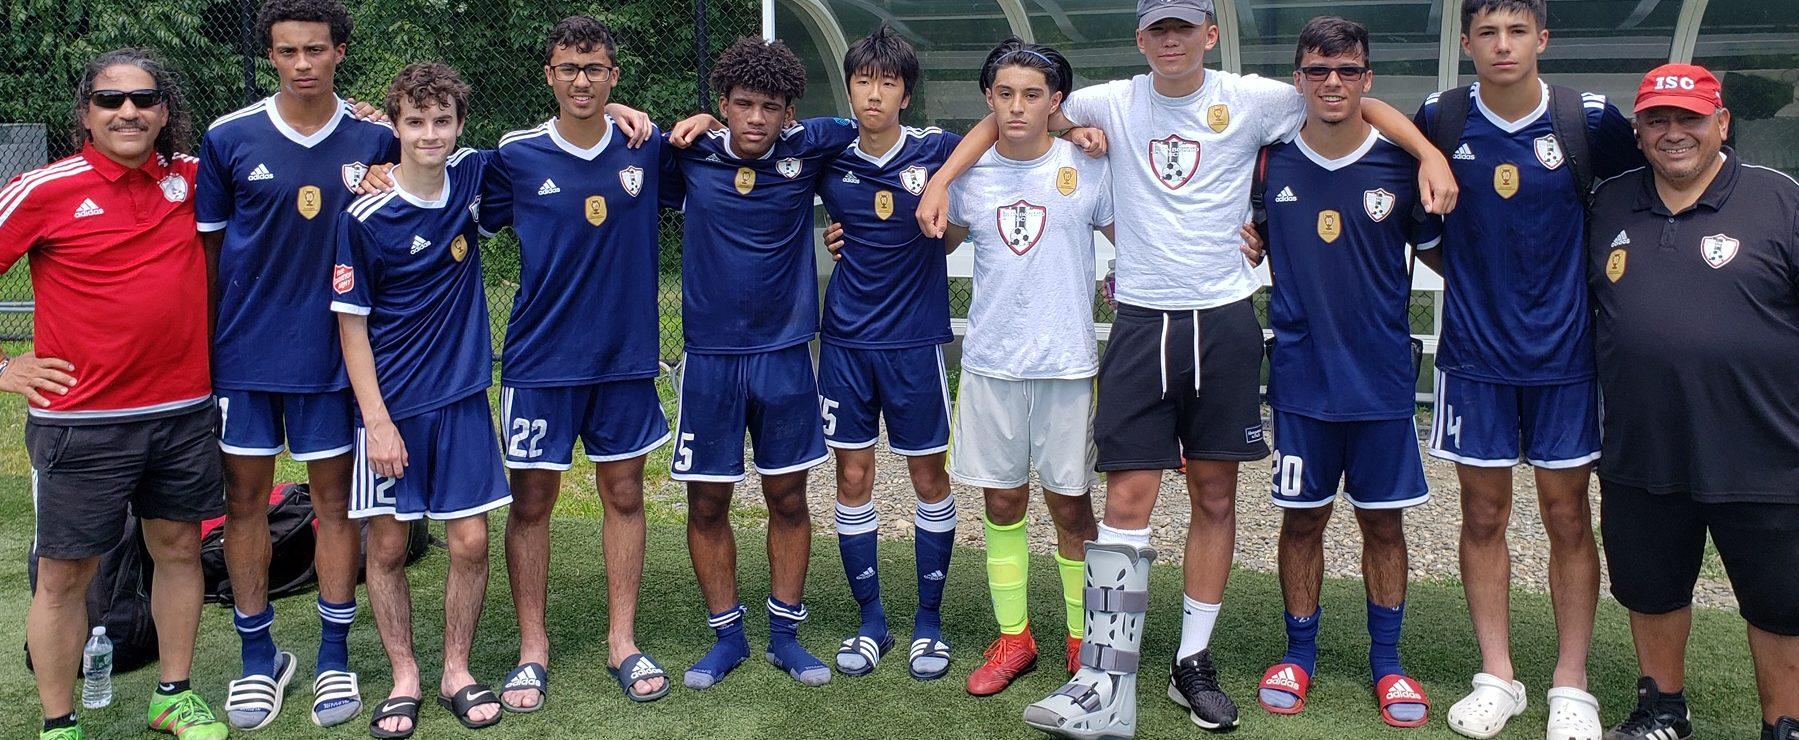 Os Internationals (sub-16) do Ironbound SC